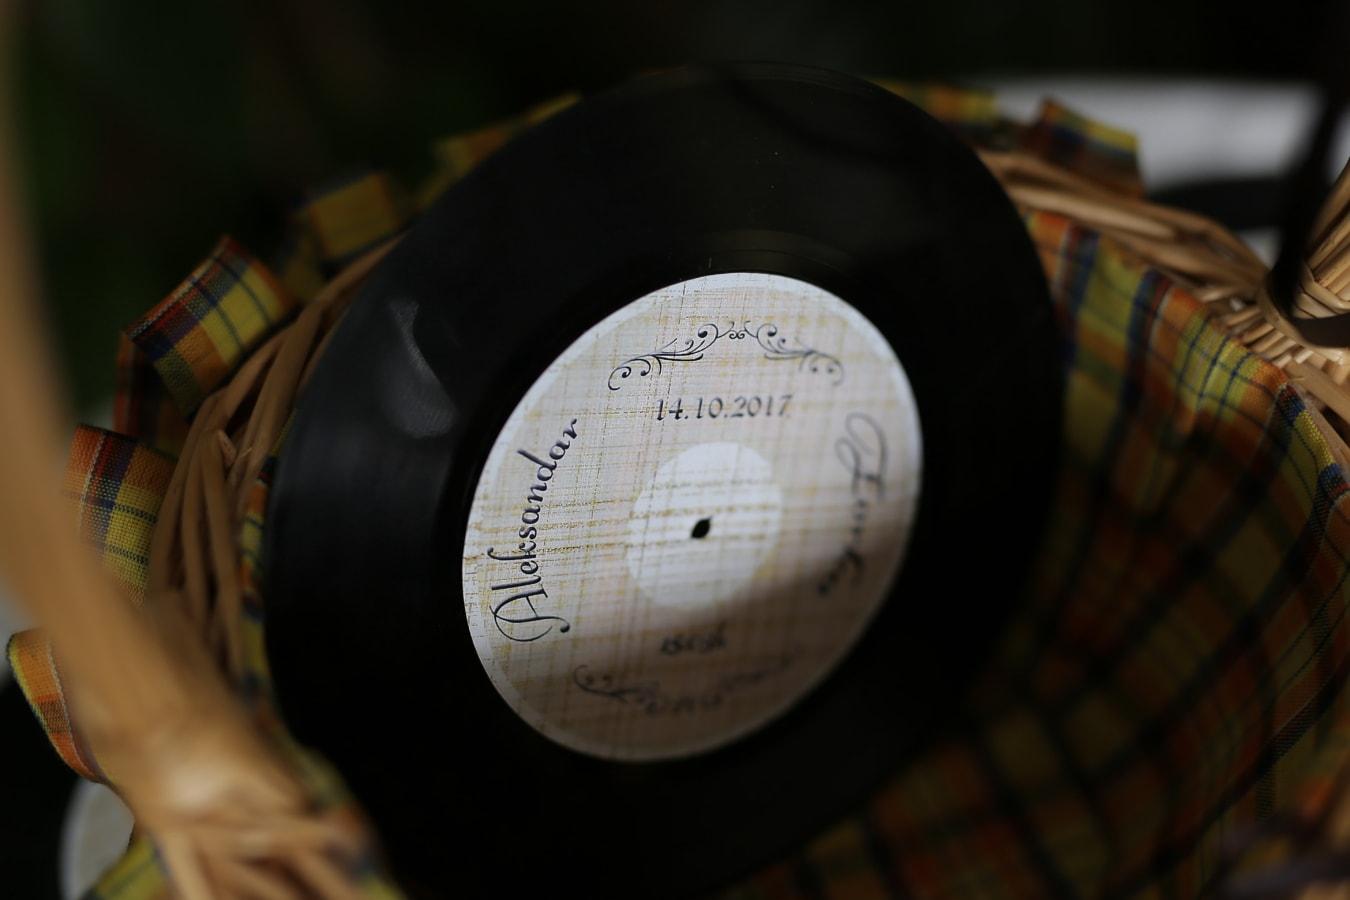 old, vinyl plate, music, wicker basket, memorabilia, nostalgia, blur, indoors, retro, vintage